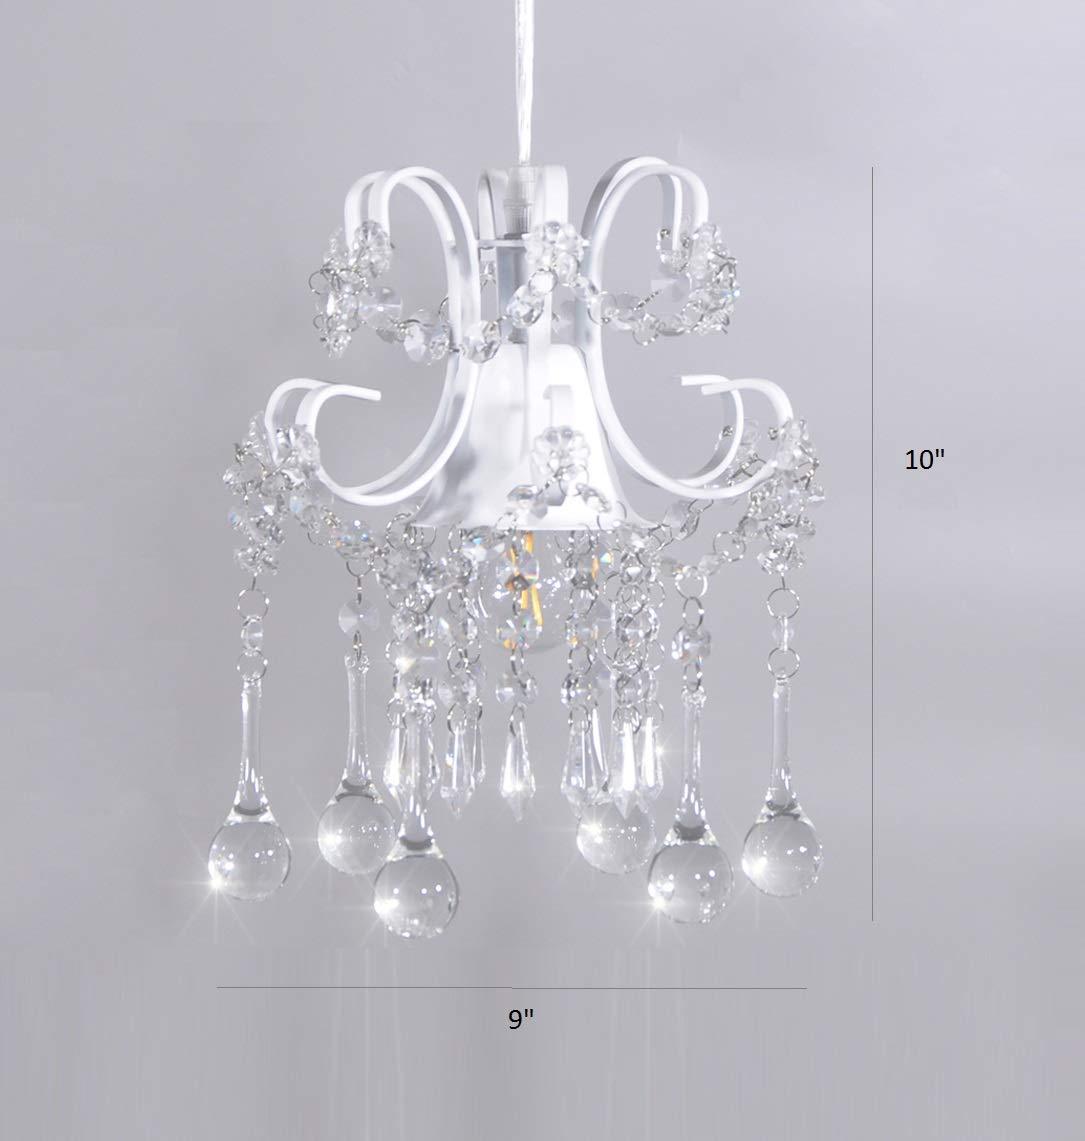 Mini Style Crystal Chandelier Pendant Light White,1-Light by Surpars House (Image #5)